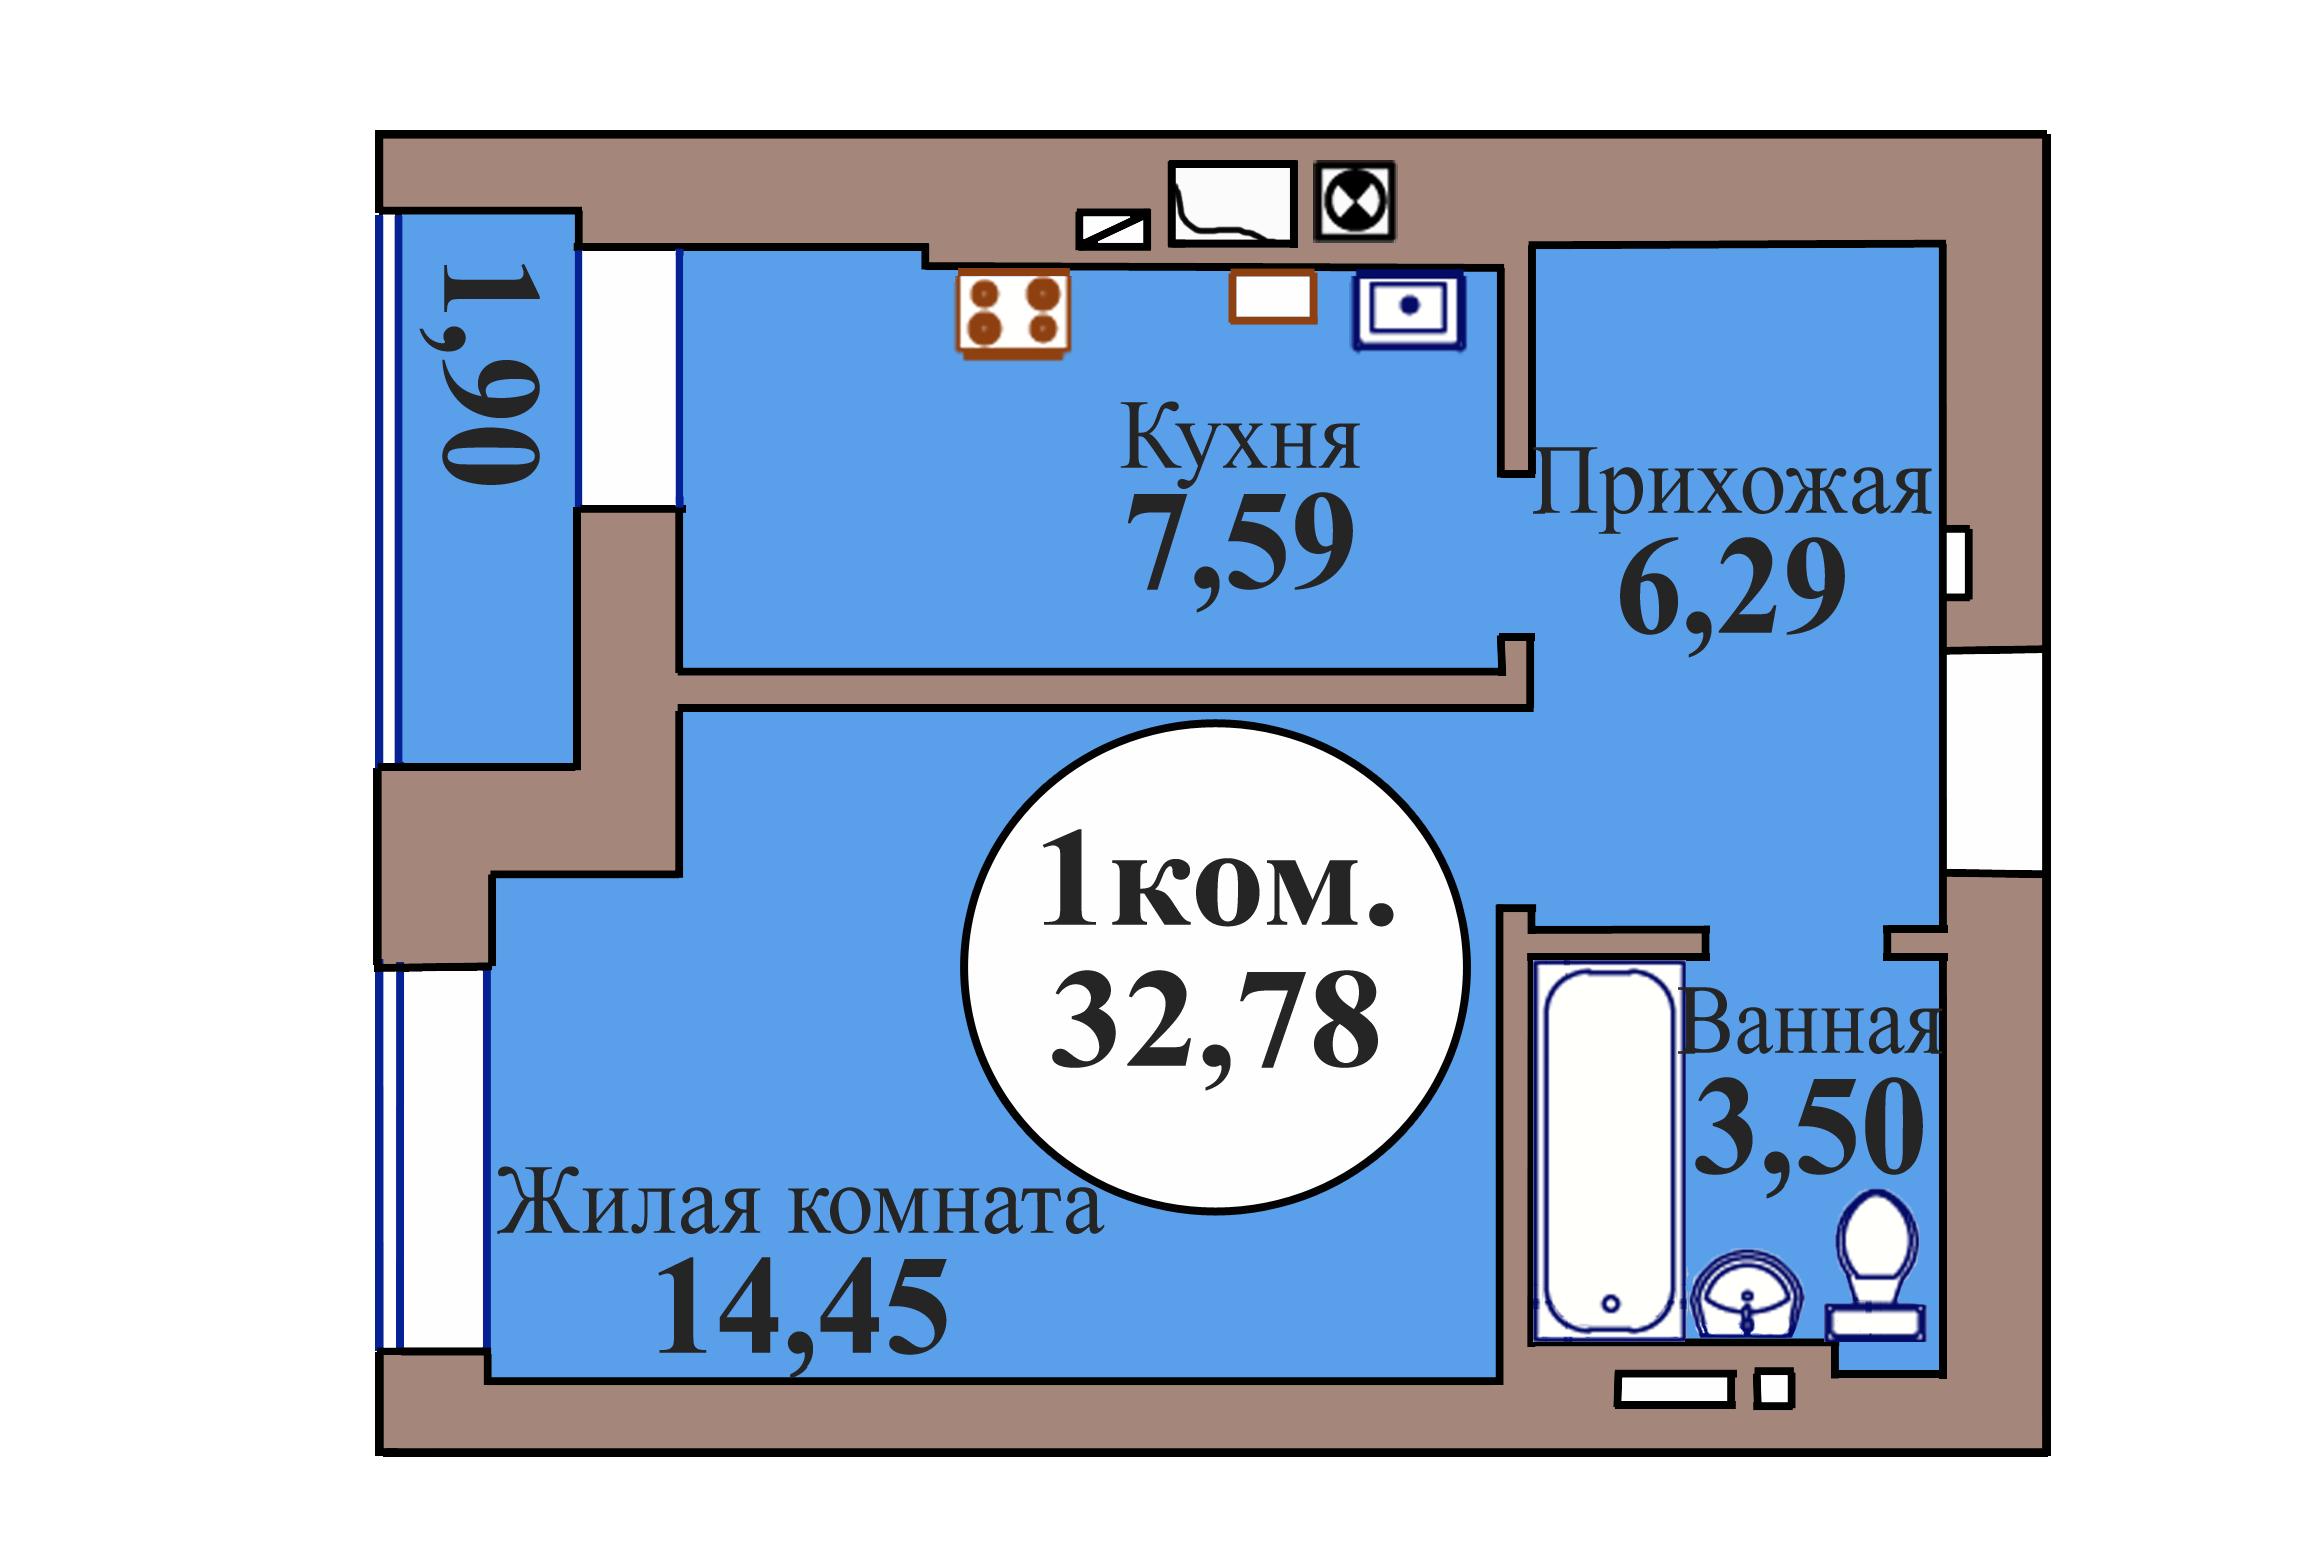 1-комн. кв. по пер. Калининградский, 5 кв. 86 в Калининграде